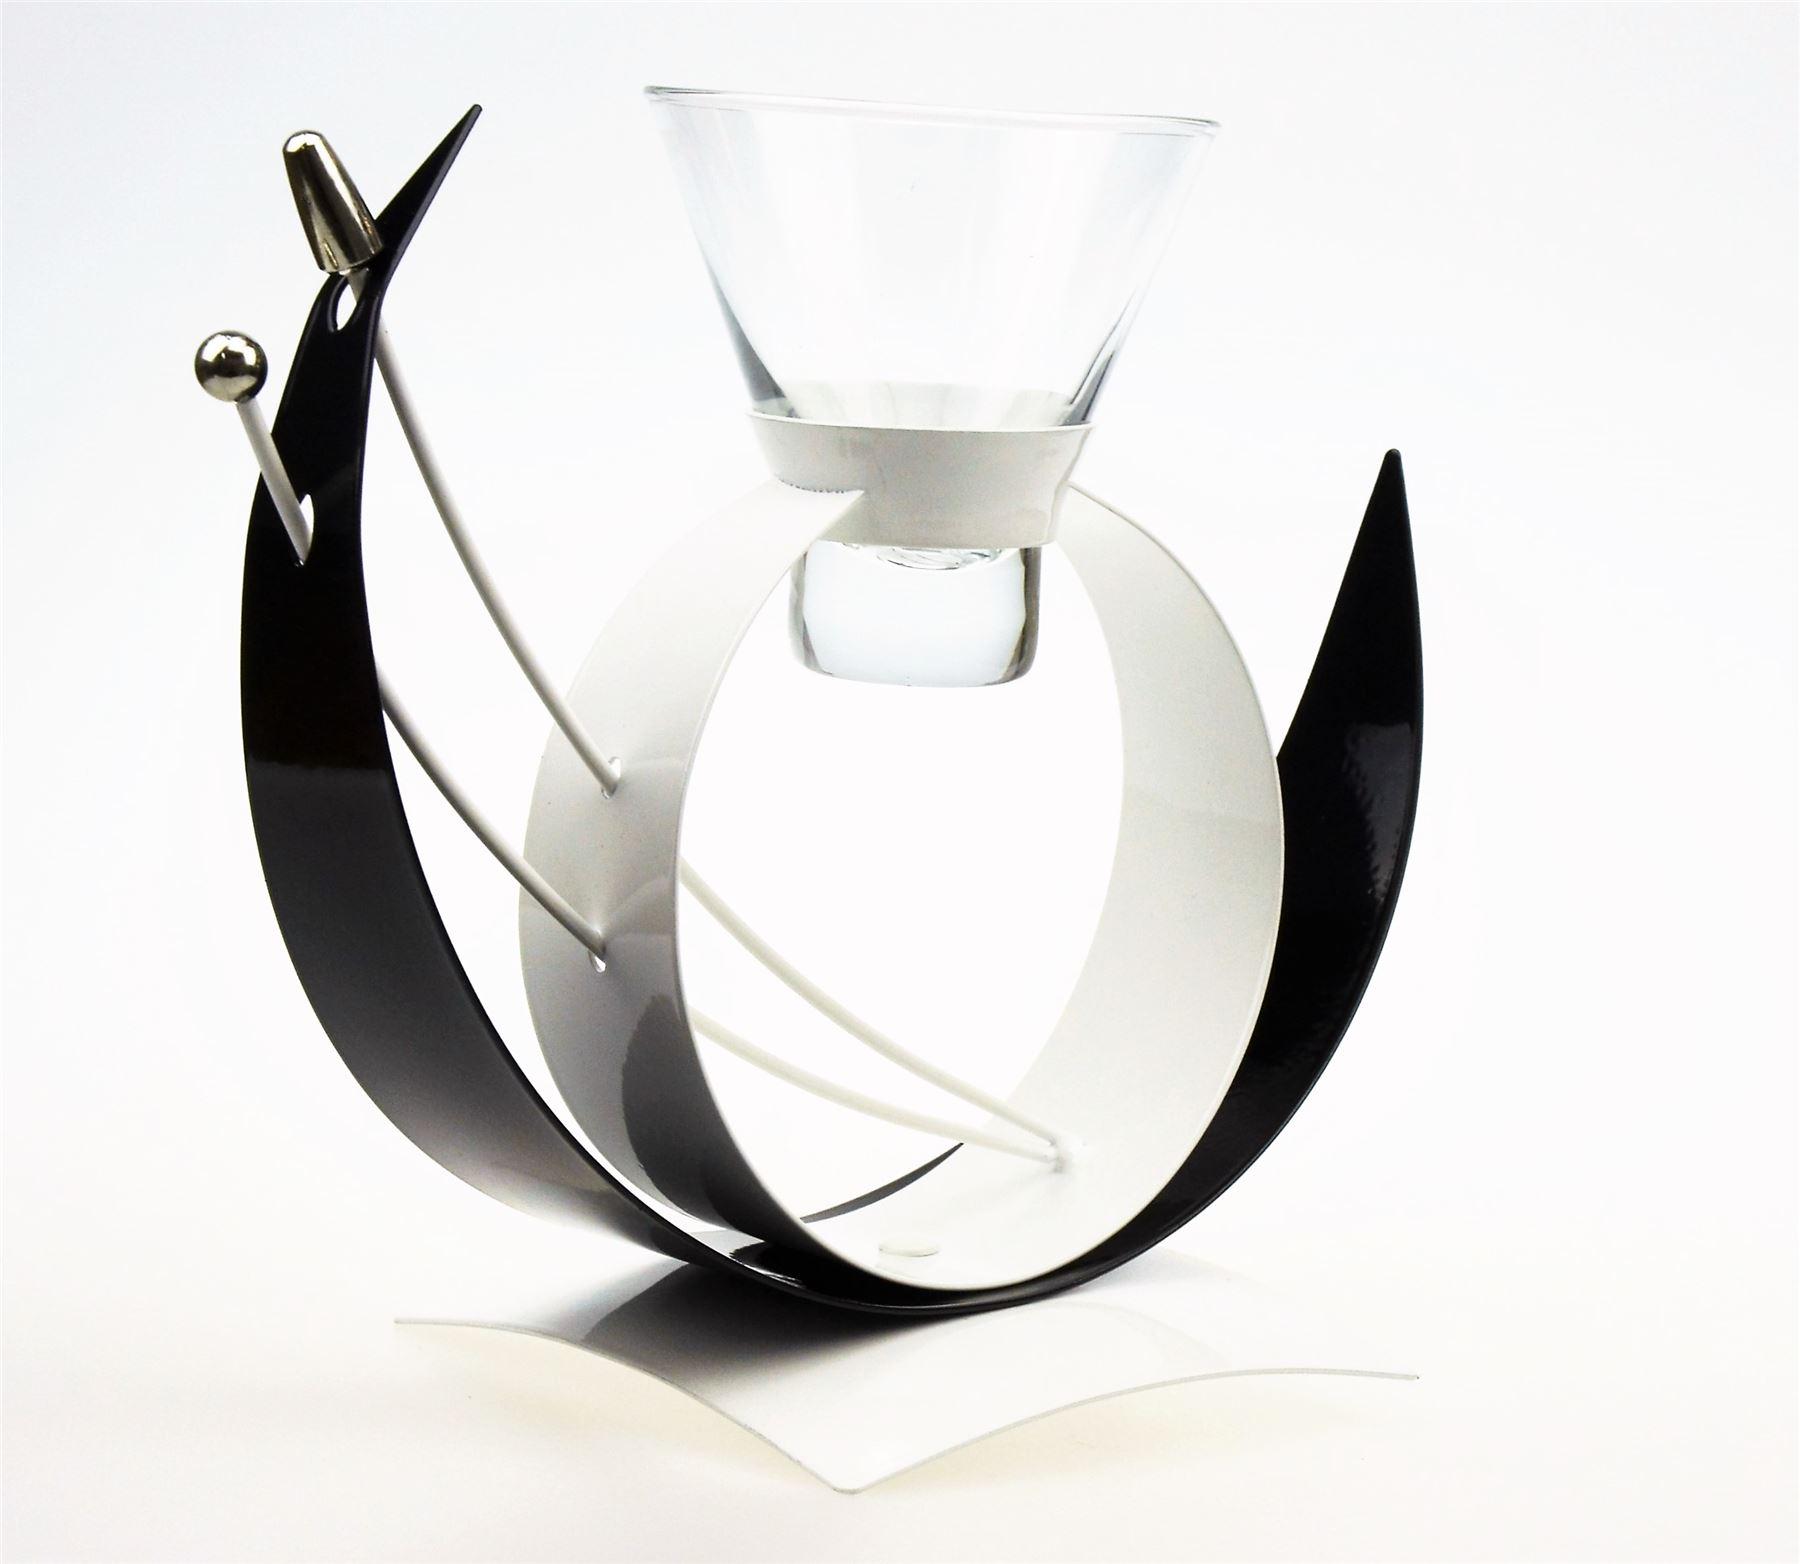 Glass Centerpiece Vase With Tea Light Holders : Candle tea light holder candlestick flower vase glass